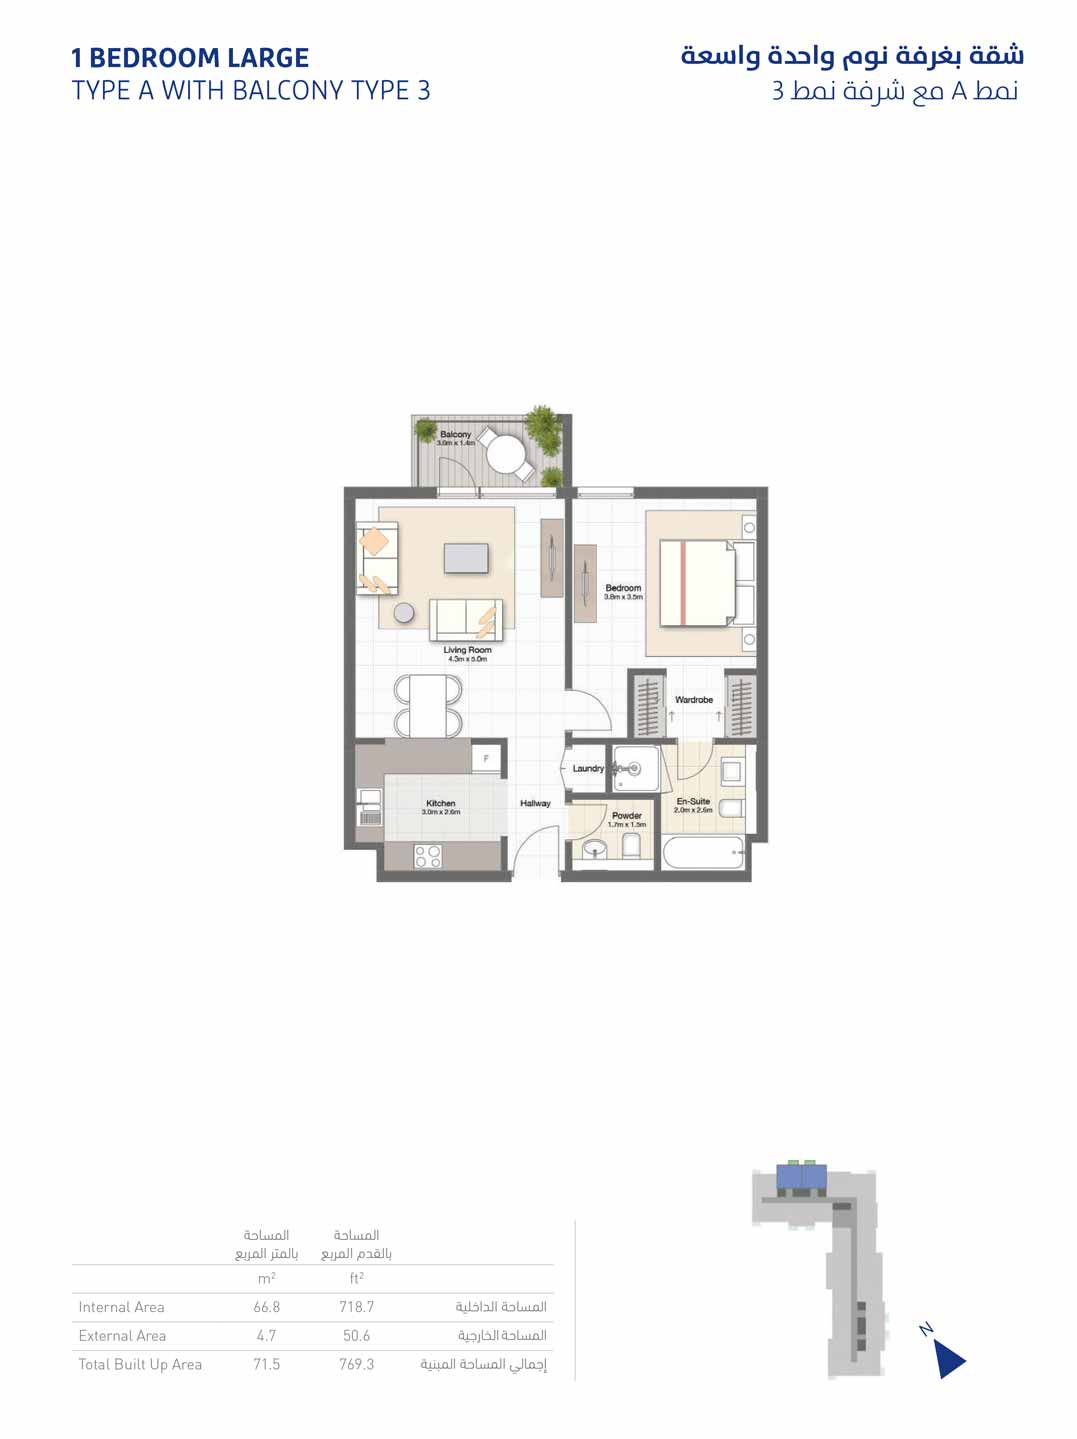 1 bedroom-Large-type-A-balcony-type-3-769